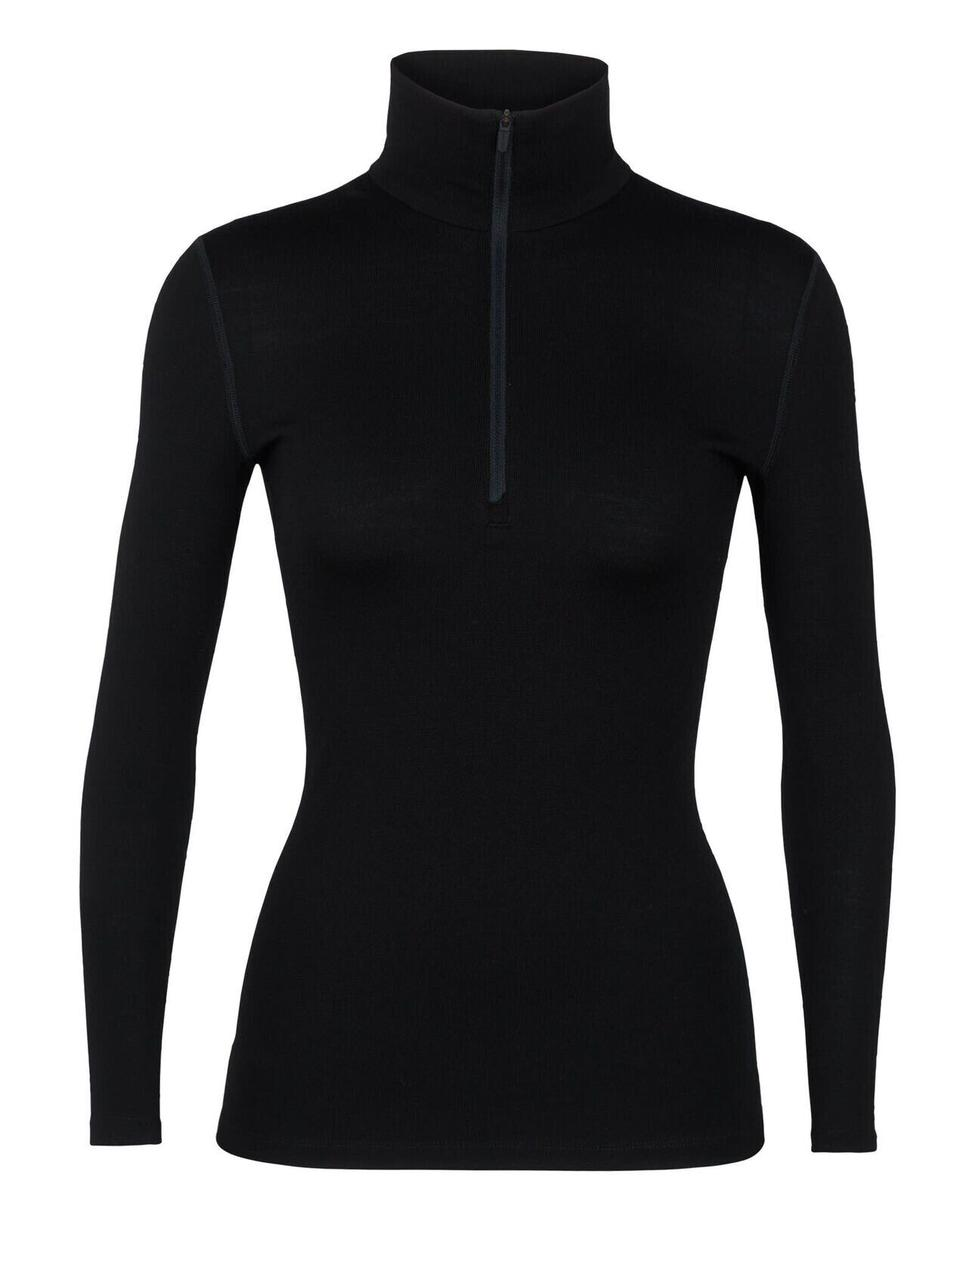 Термофутболка женская Icebreaker 260 Tech Long Sleeve Half Zip Black M (104 390 001 M)